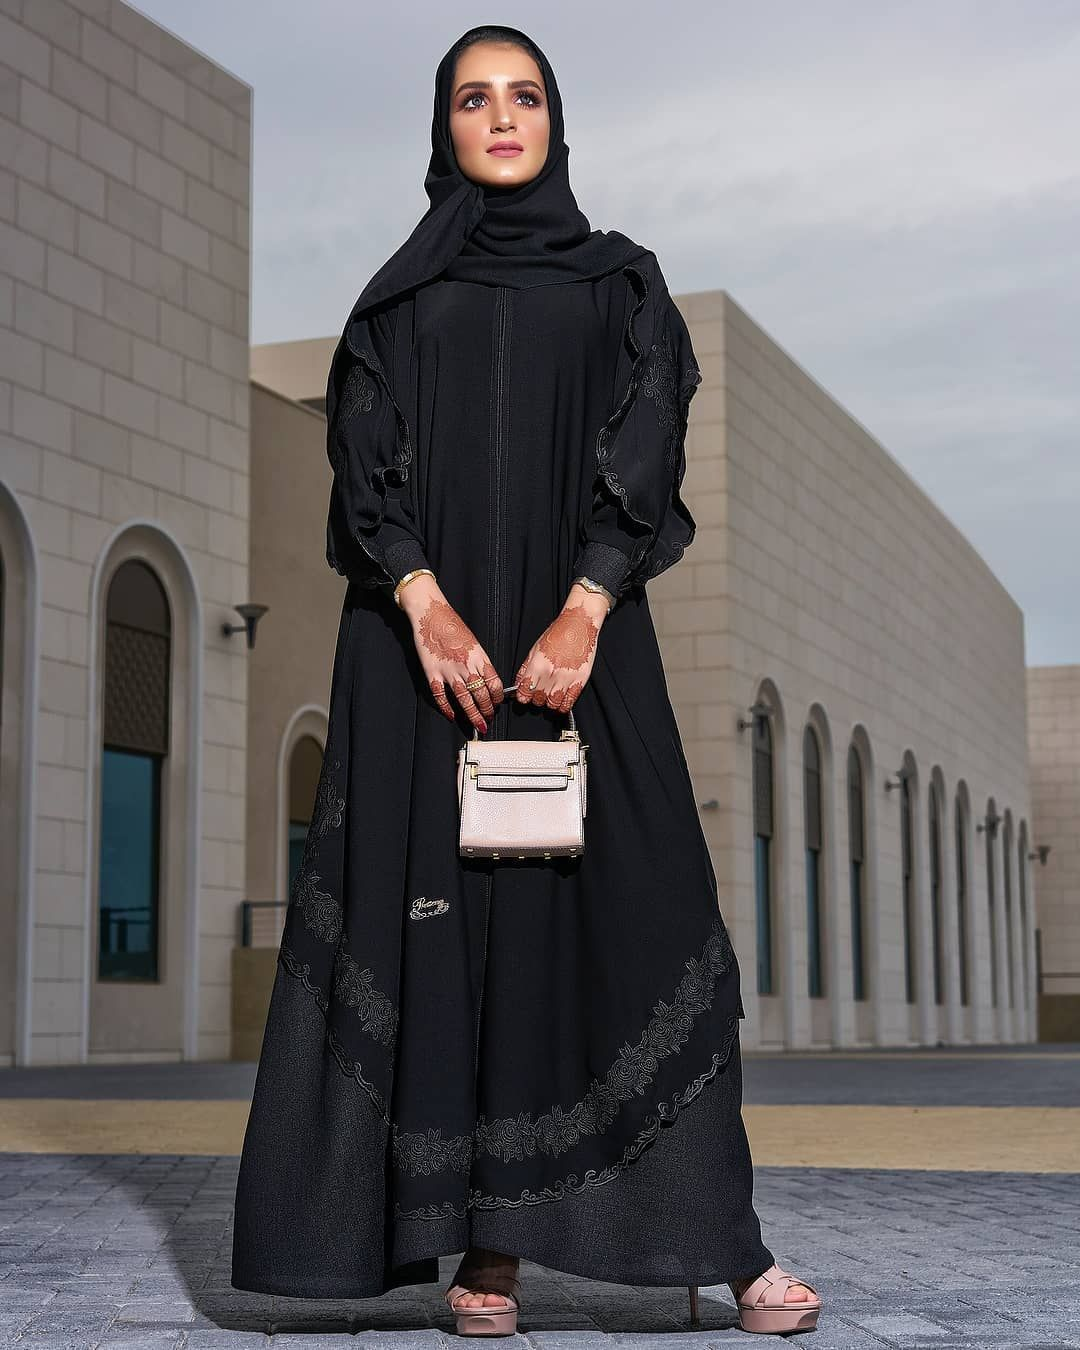 Repost Kam 227 With Instatoolsapp واخيرا كولكشن من تصميم بريتني الطابع الي اخترناه لهذا الكولكشن طابع كلاسيكي ي Abaya Fashion Fashion Fashion Outfits